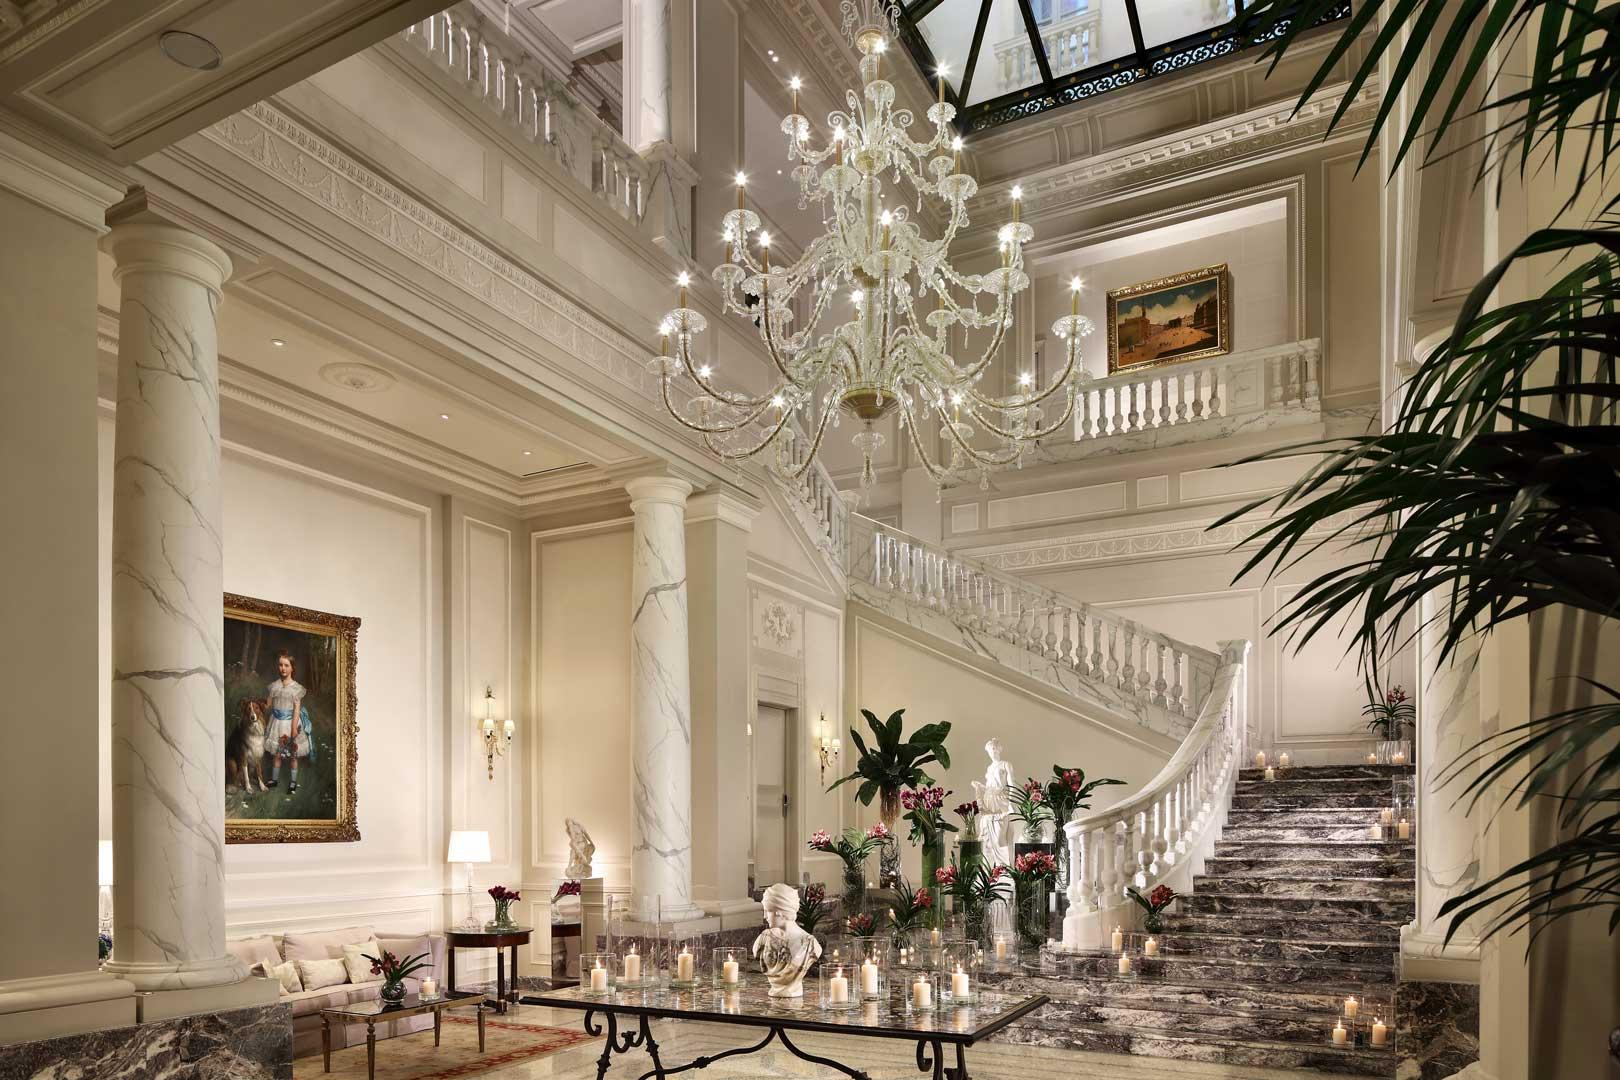 Palazzo Parigi Hotel - Milano